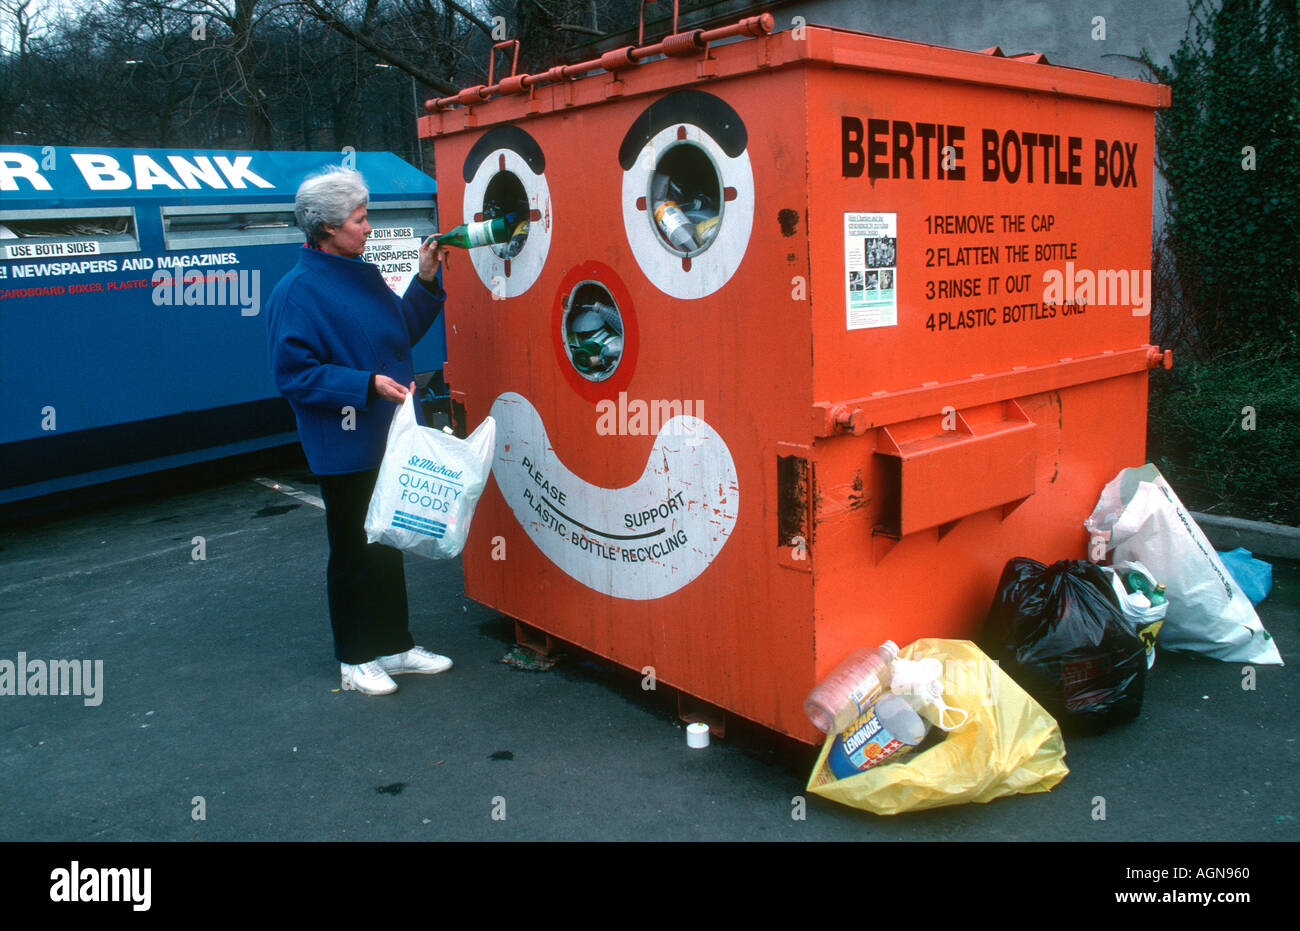 Bertie bottle bank plastic bottle recycling Tesco Car Park Leeds UK - Stock Image